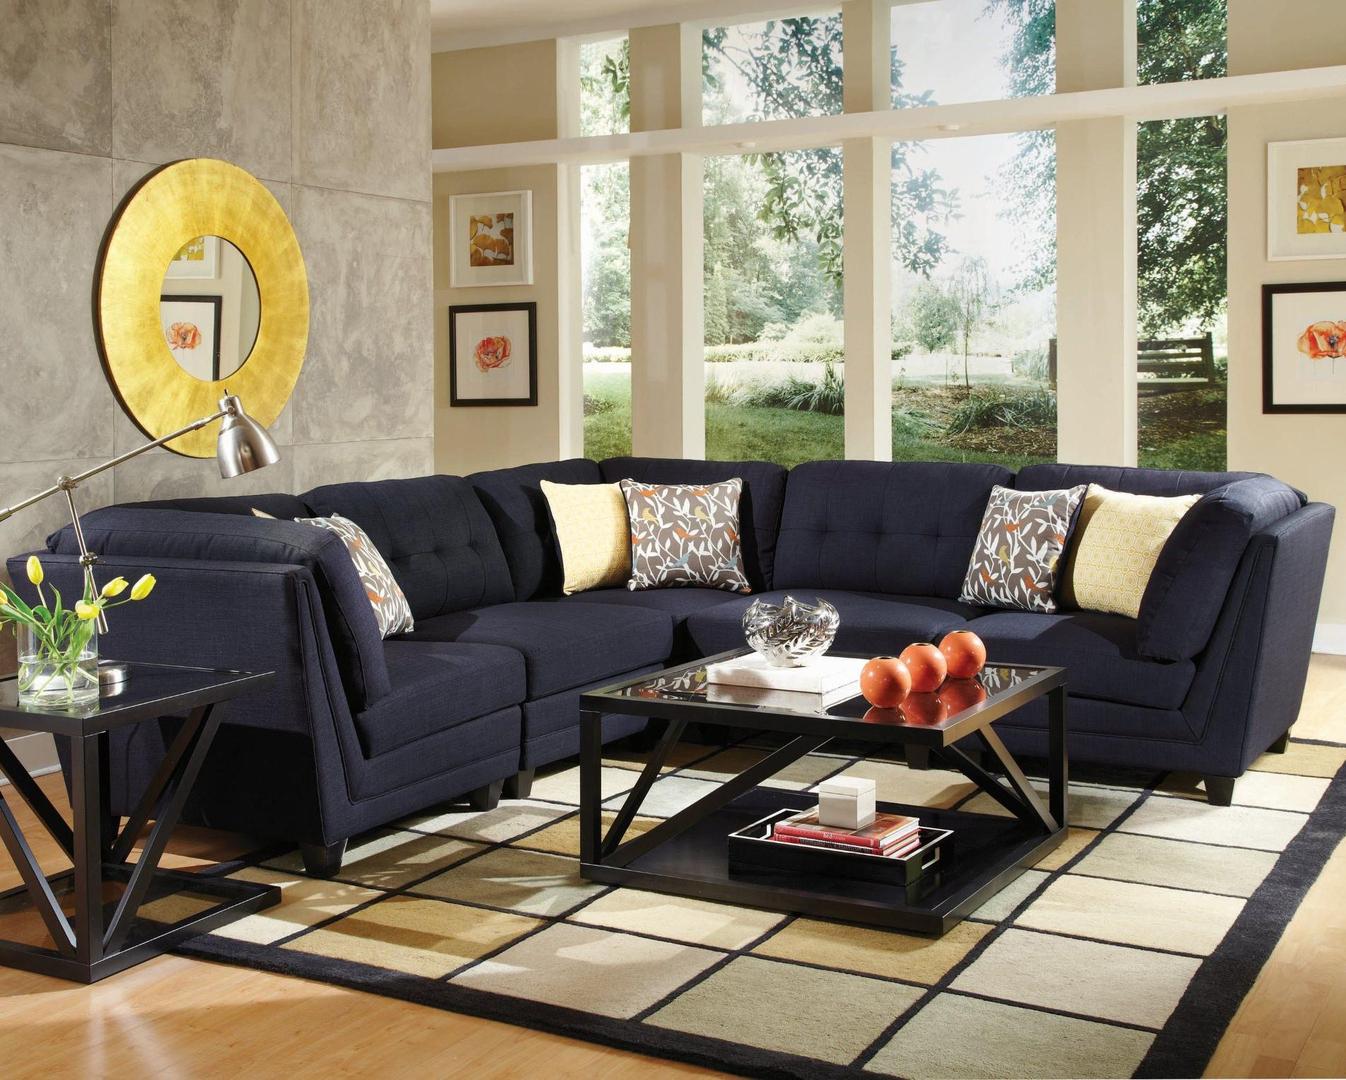 furniture mattresses home store furnishings and mattresses